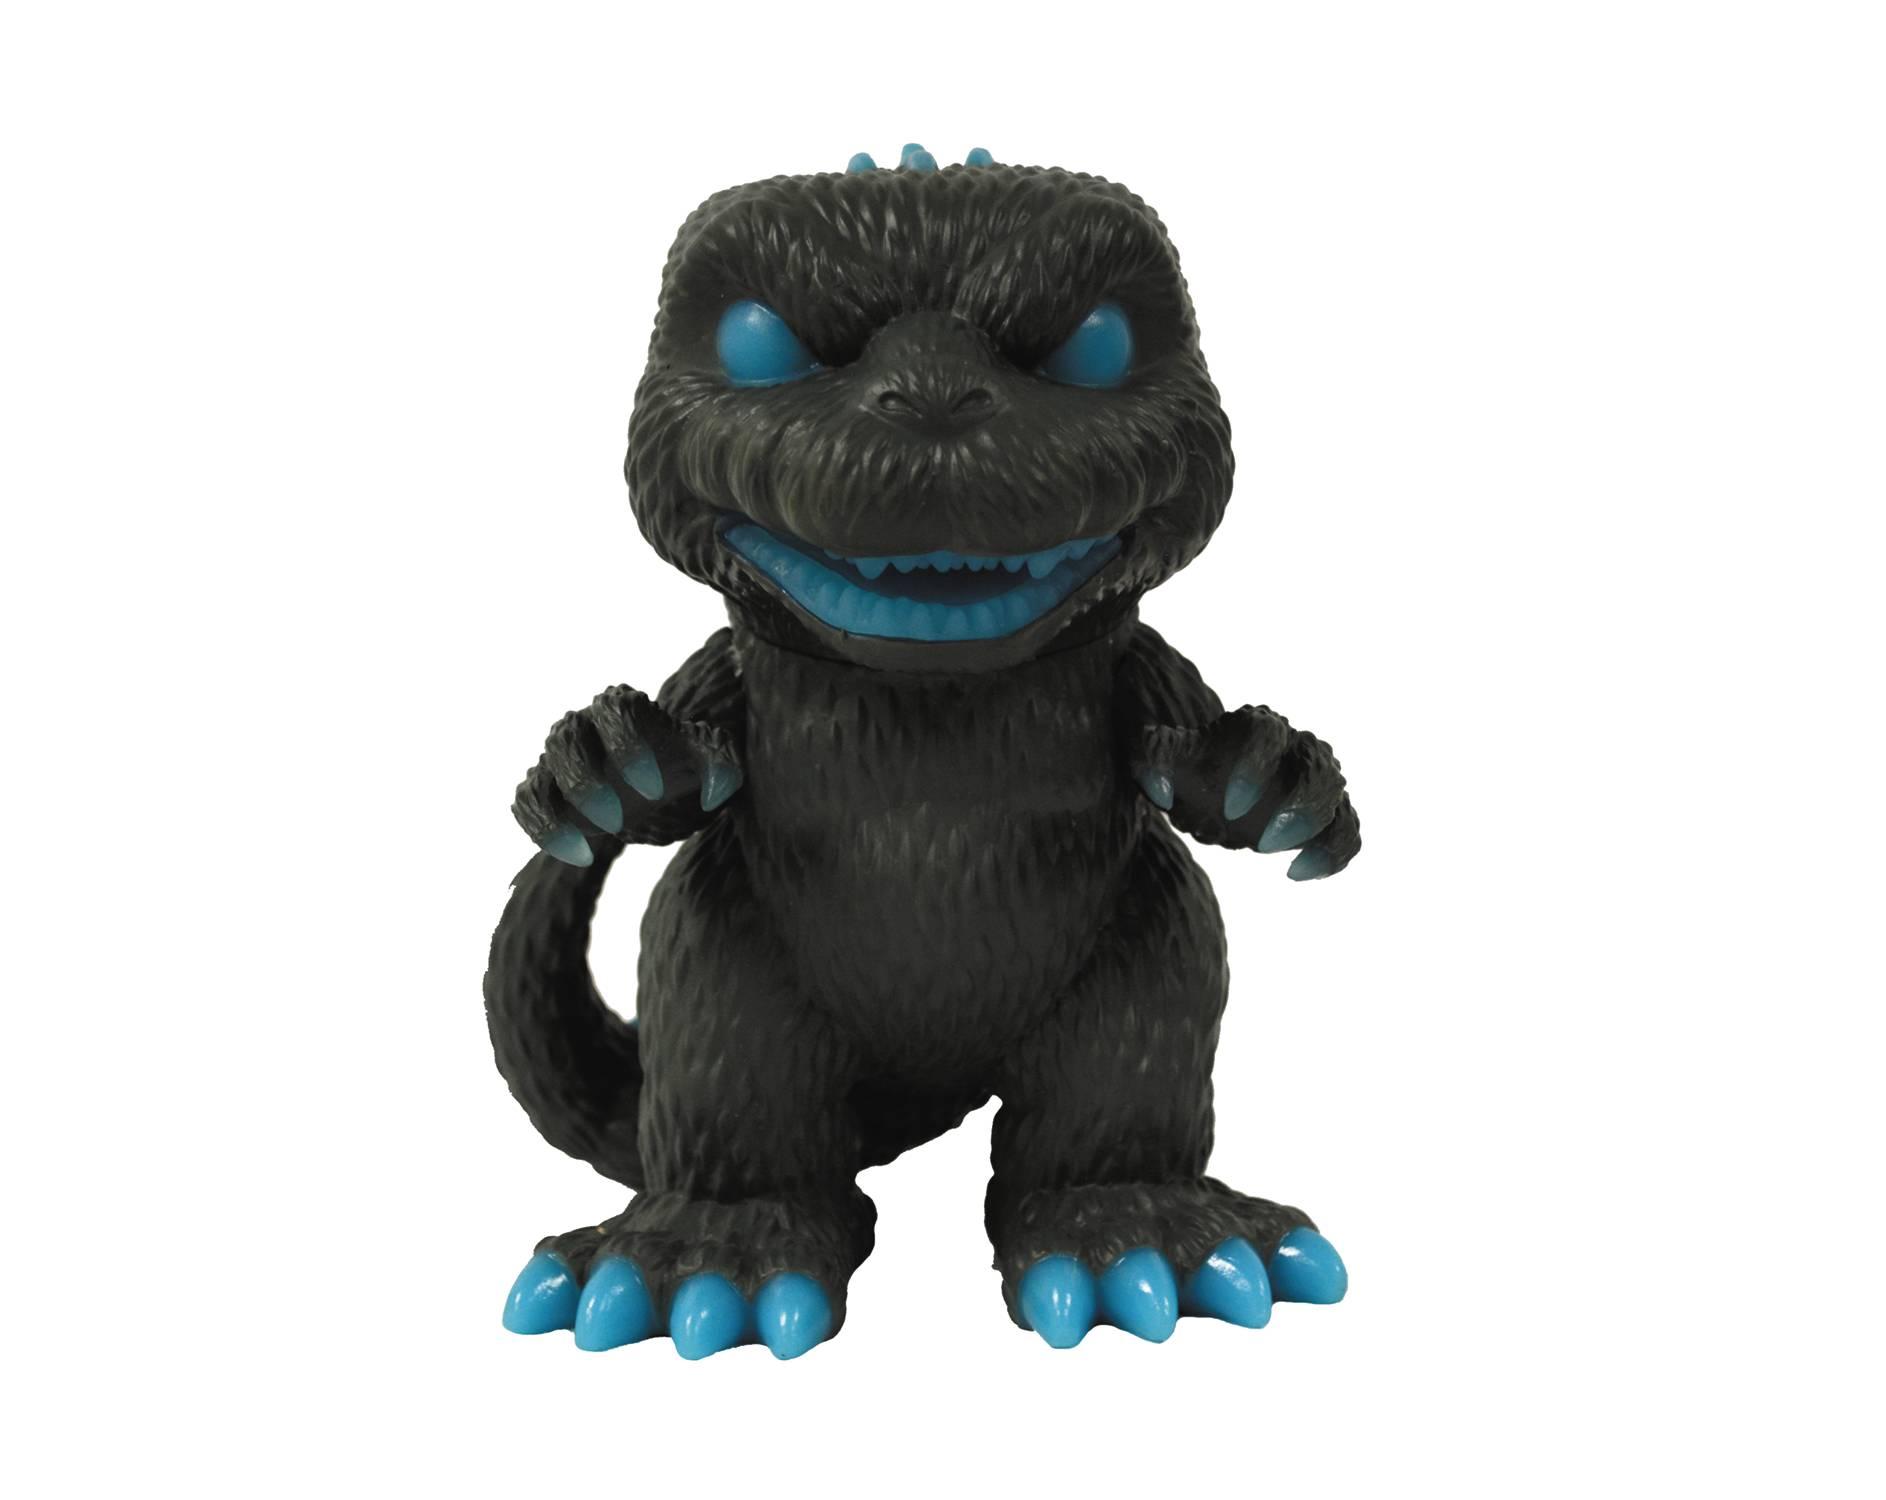 Godzilla Has A Case Of Atomic Breath In Latest Funko Pop